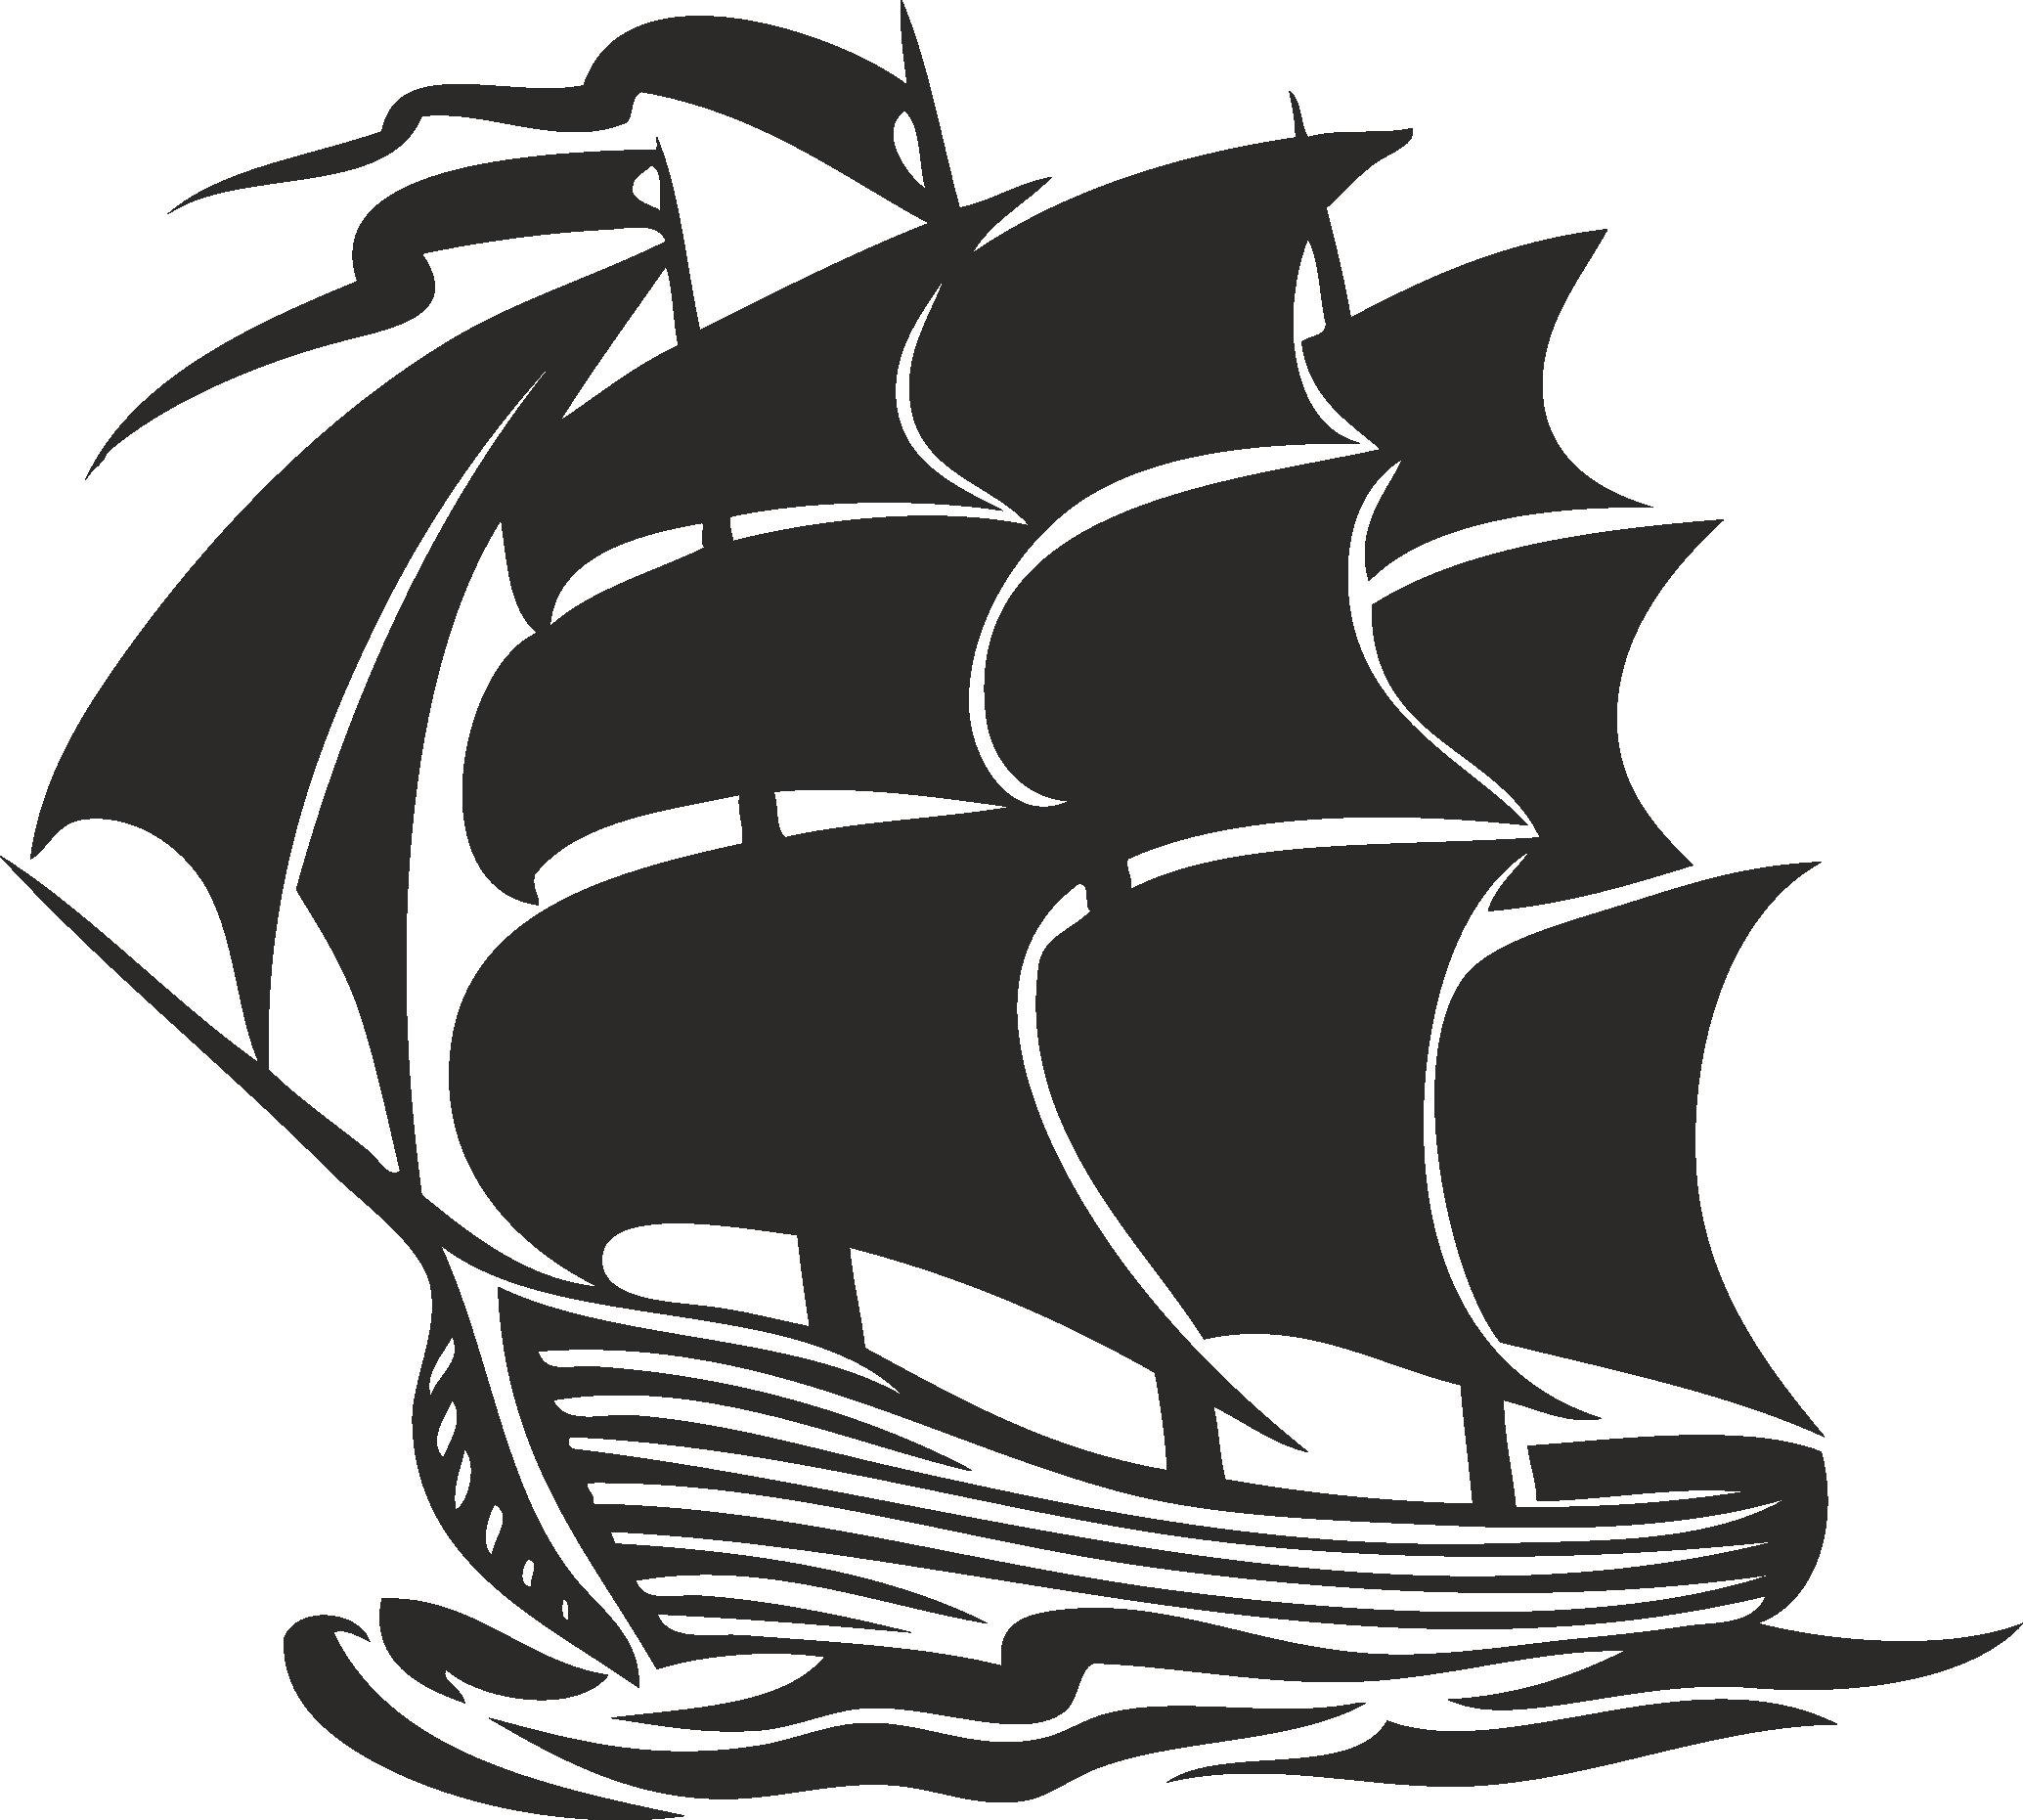 Sailboat Beautiful Silhouettes Of Sailing Ships 12 Free DXF File